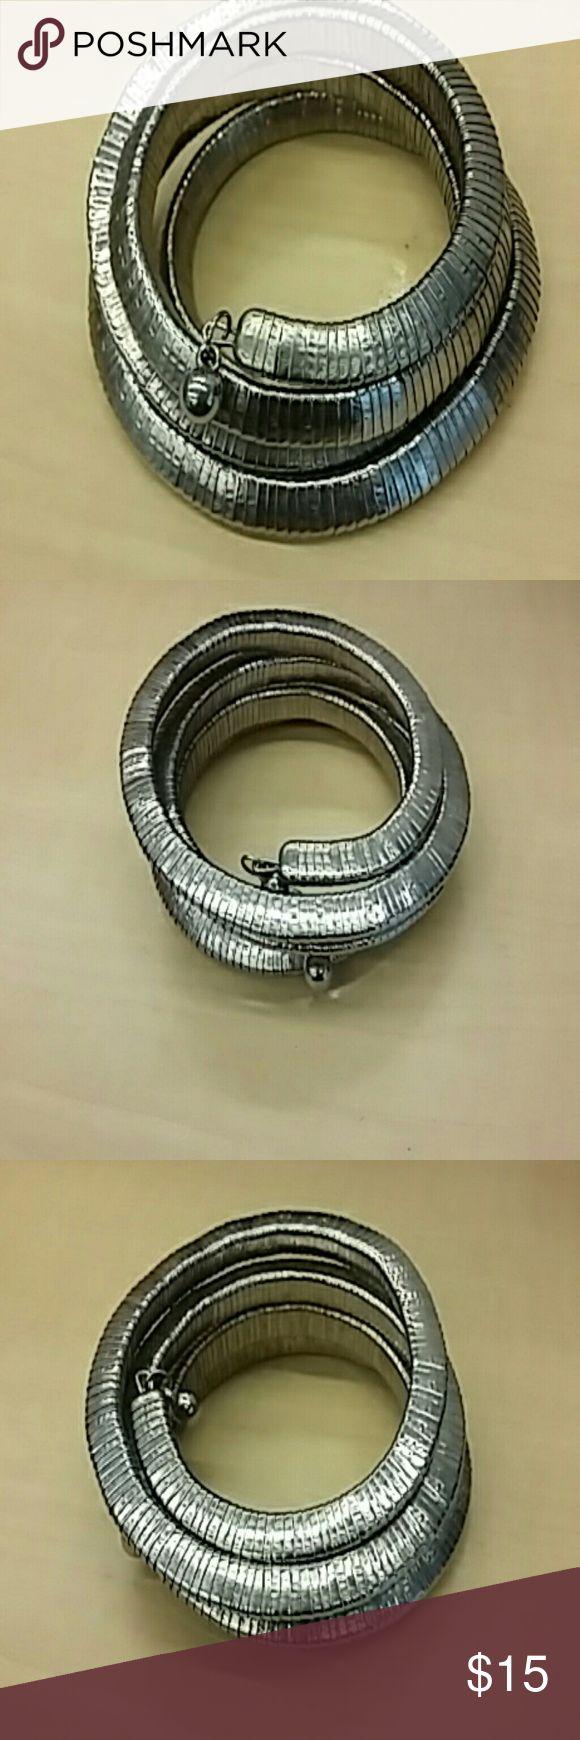 "Silver mesh ""snake"" bracelet Heavy silver mesh bracelet wraps around arm like a snake. Small silver balls on each tip Jewelry Bracelets"